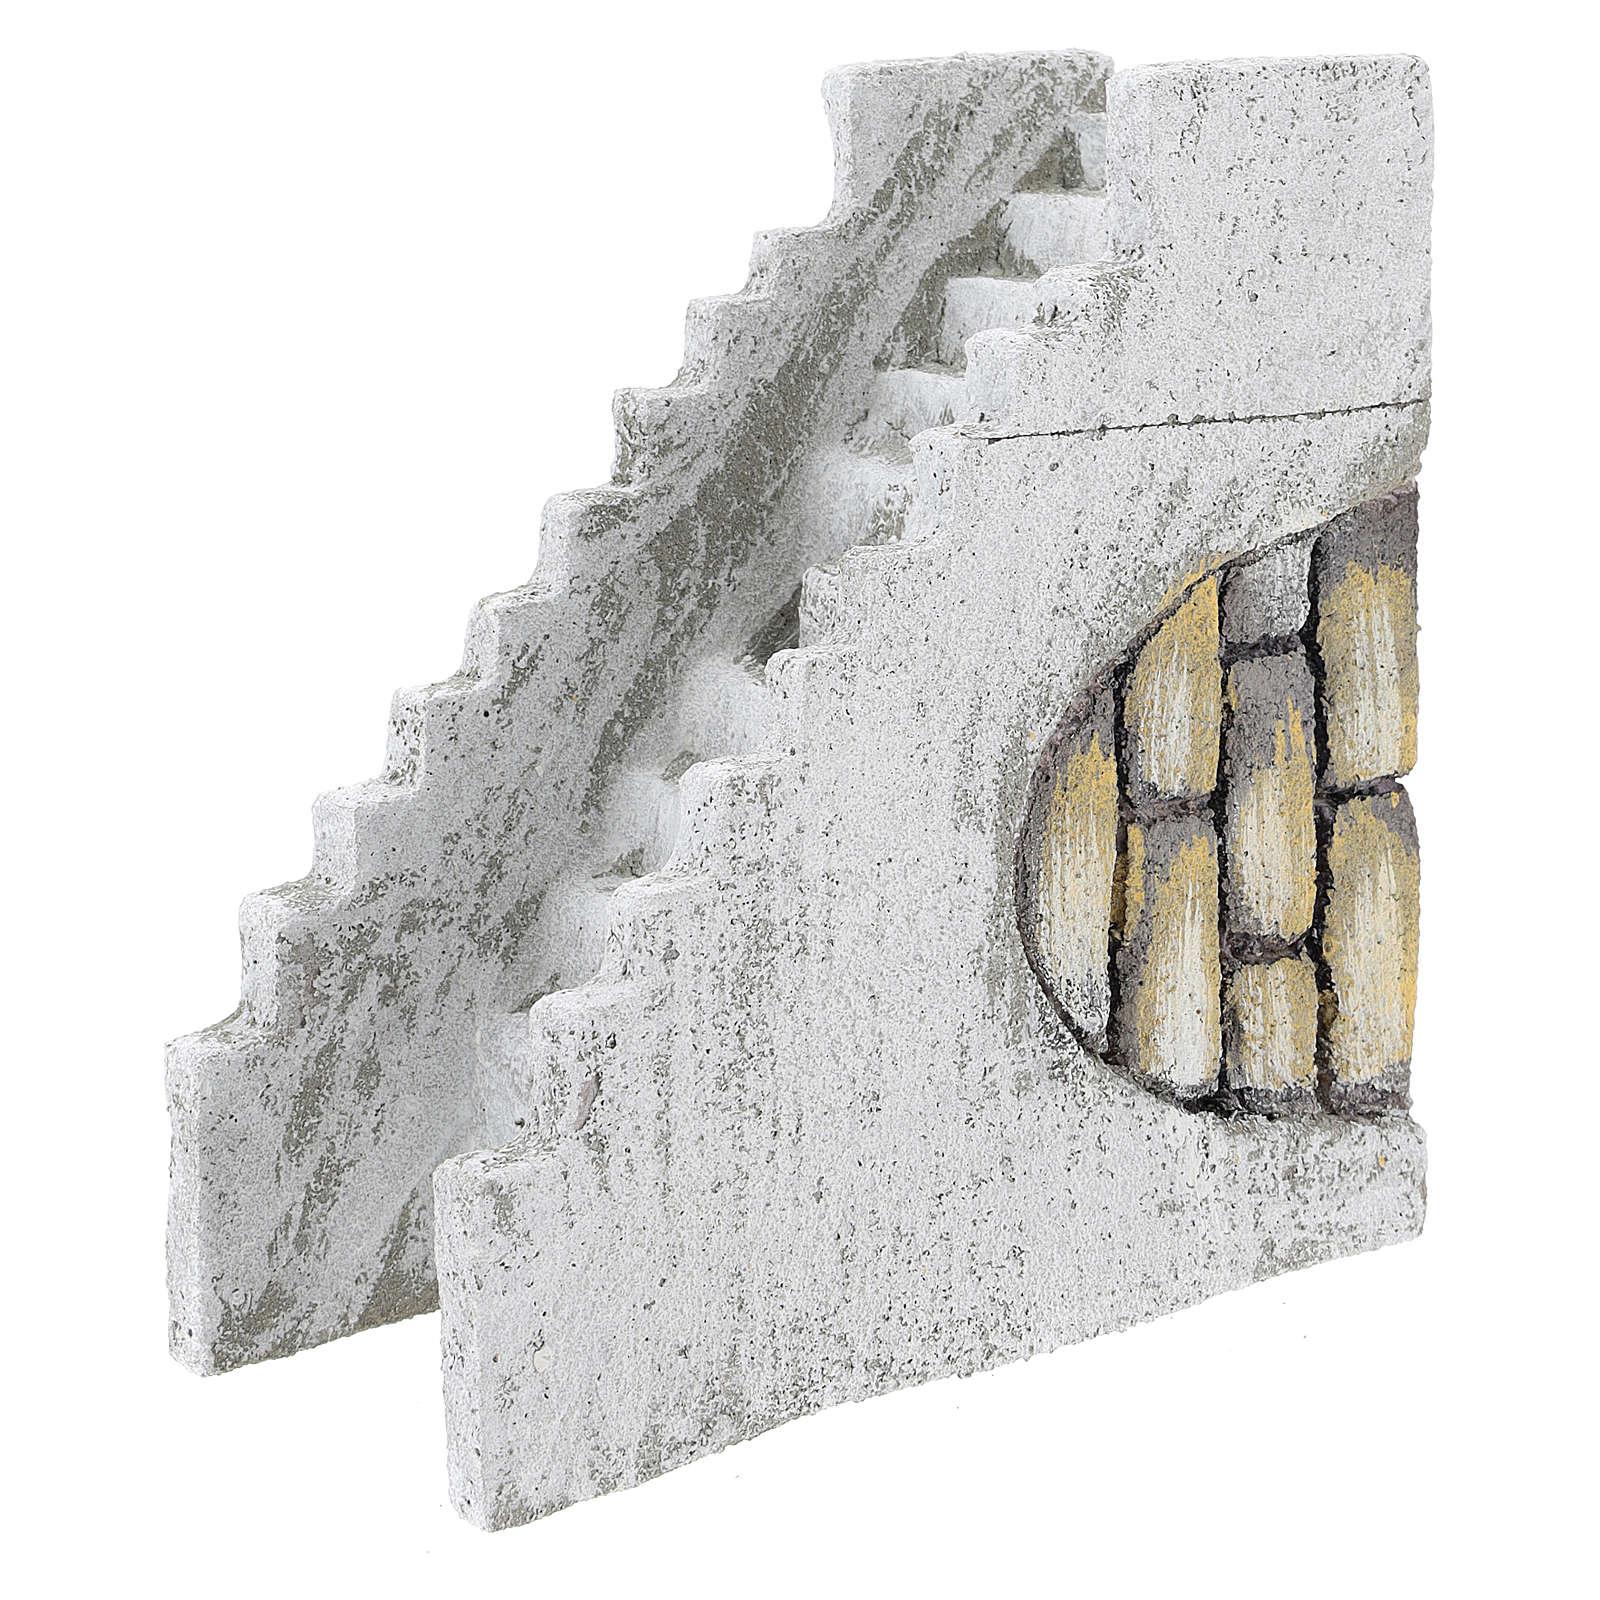 Straight staircase for Neapolitan Nativity scene of 8 cm 4